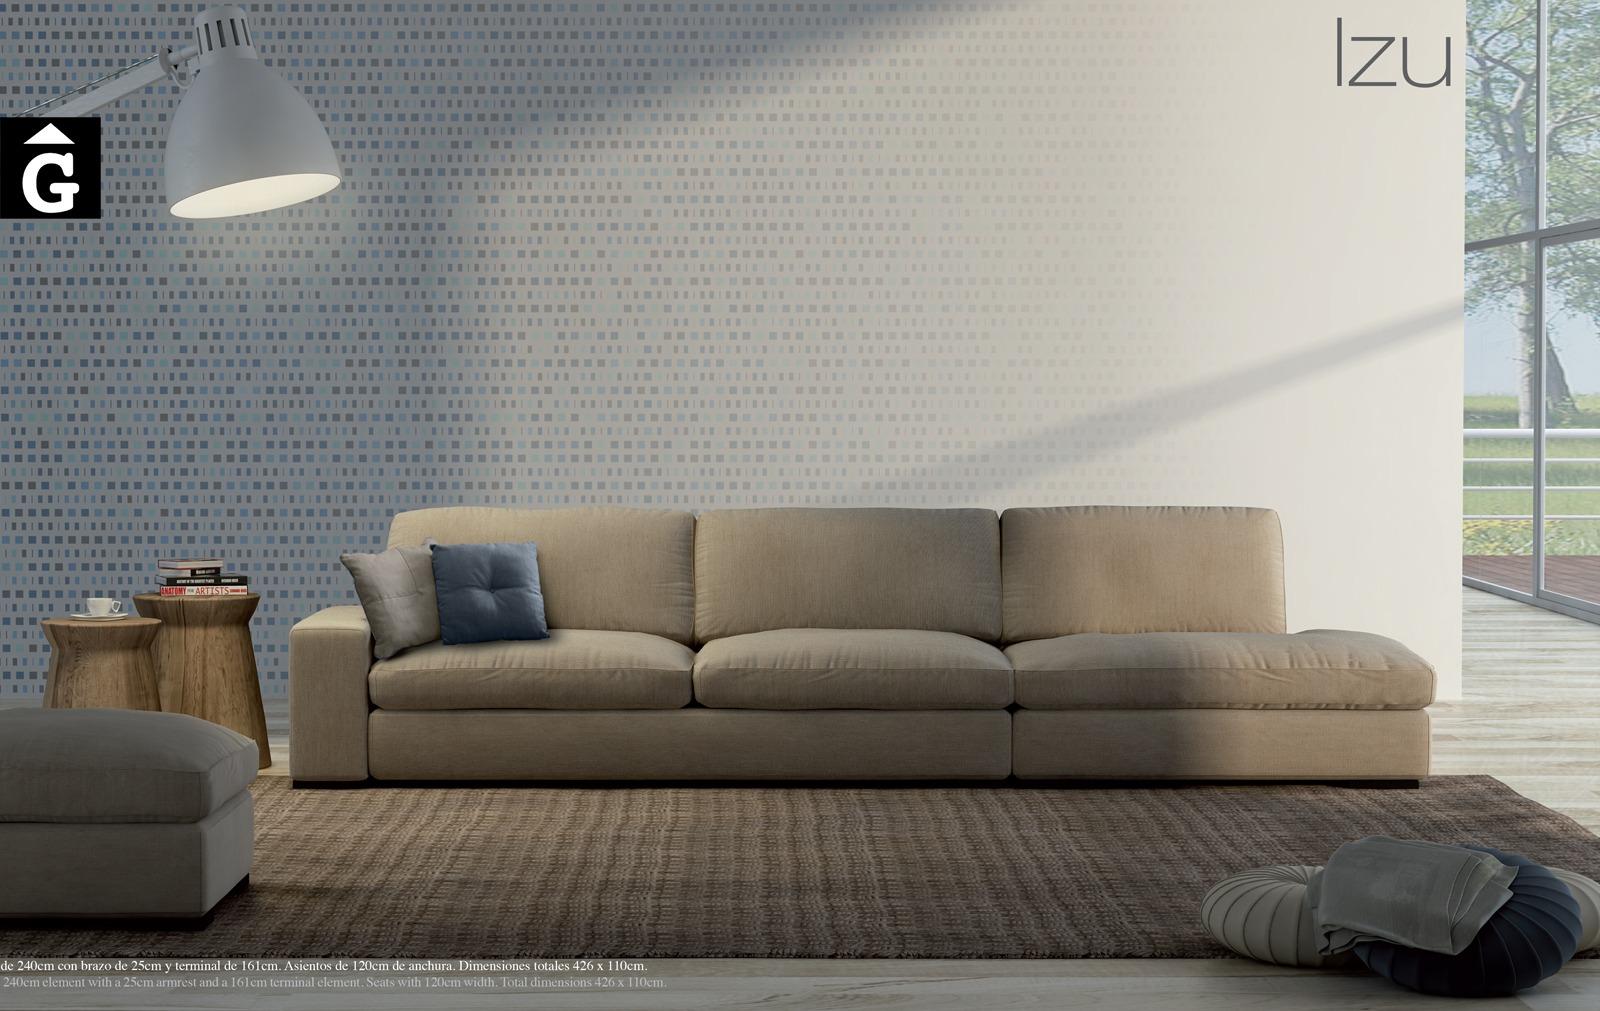 Izu Moradillo by mobles Gifreu tapisseria de qualitat sofas relax llits puff pouf chaixelongues butaques sillons